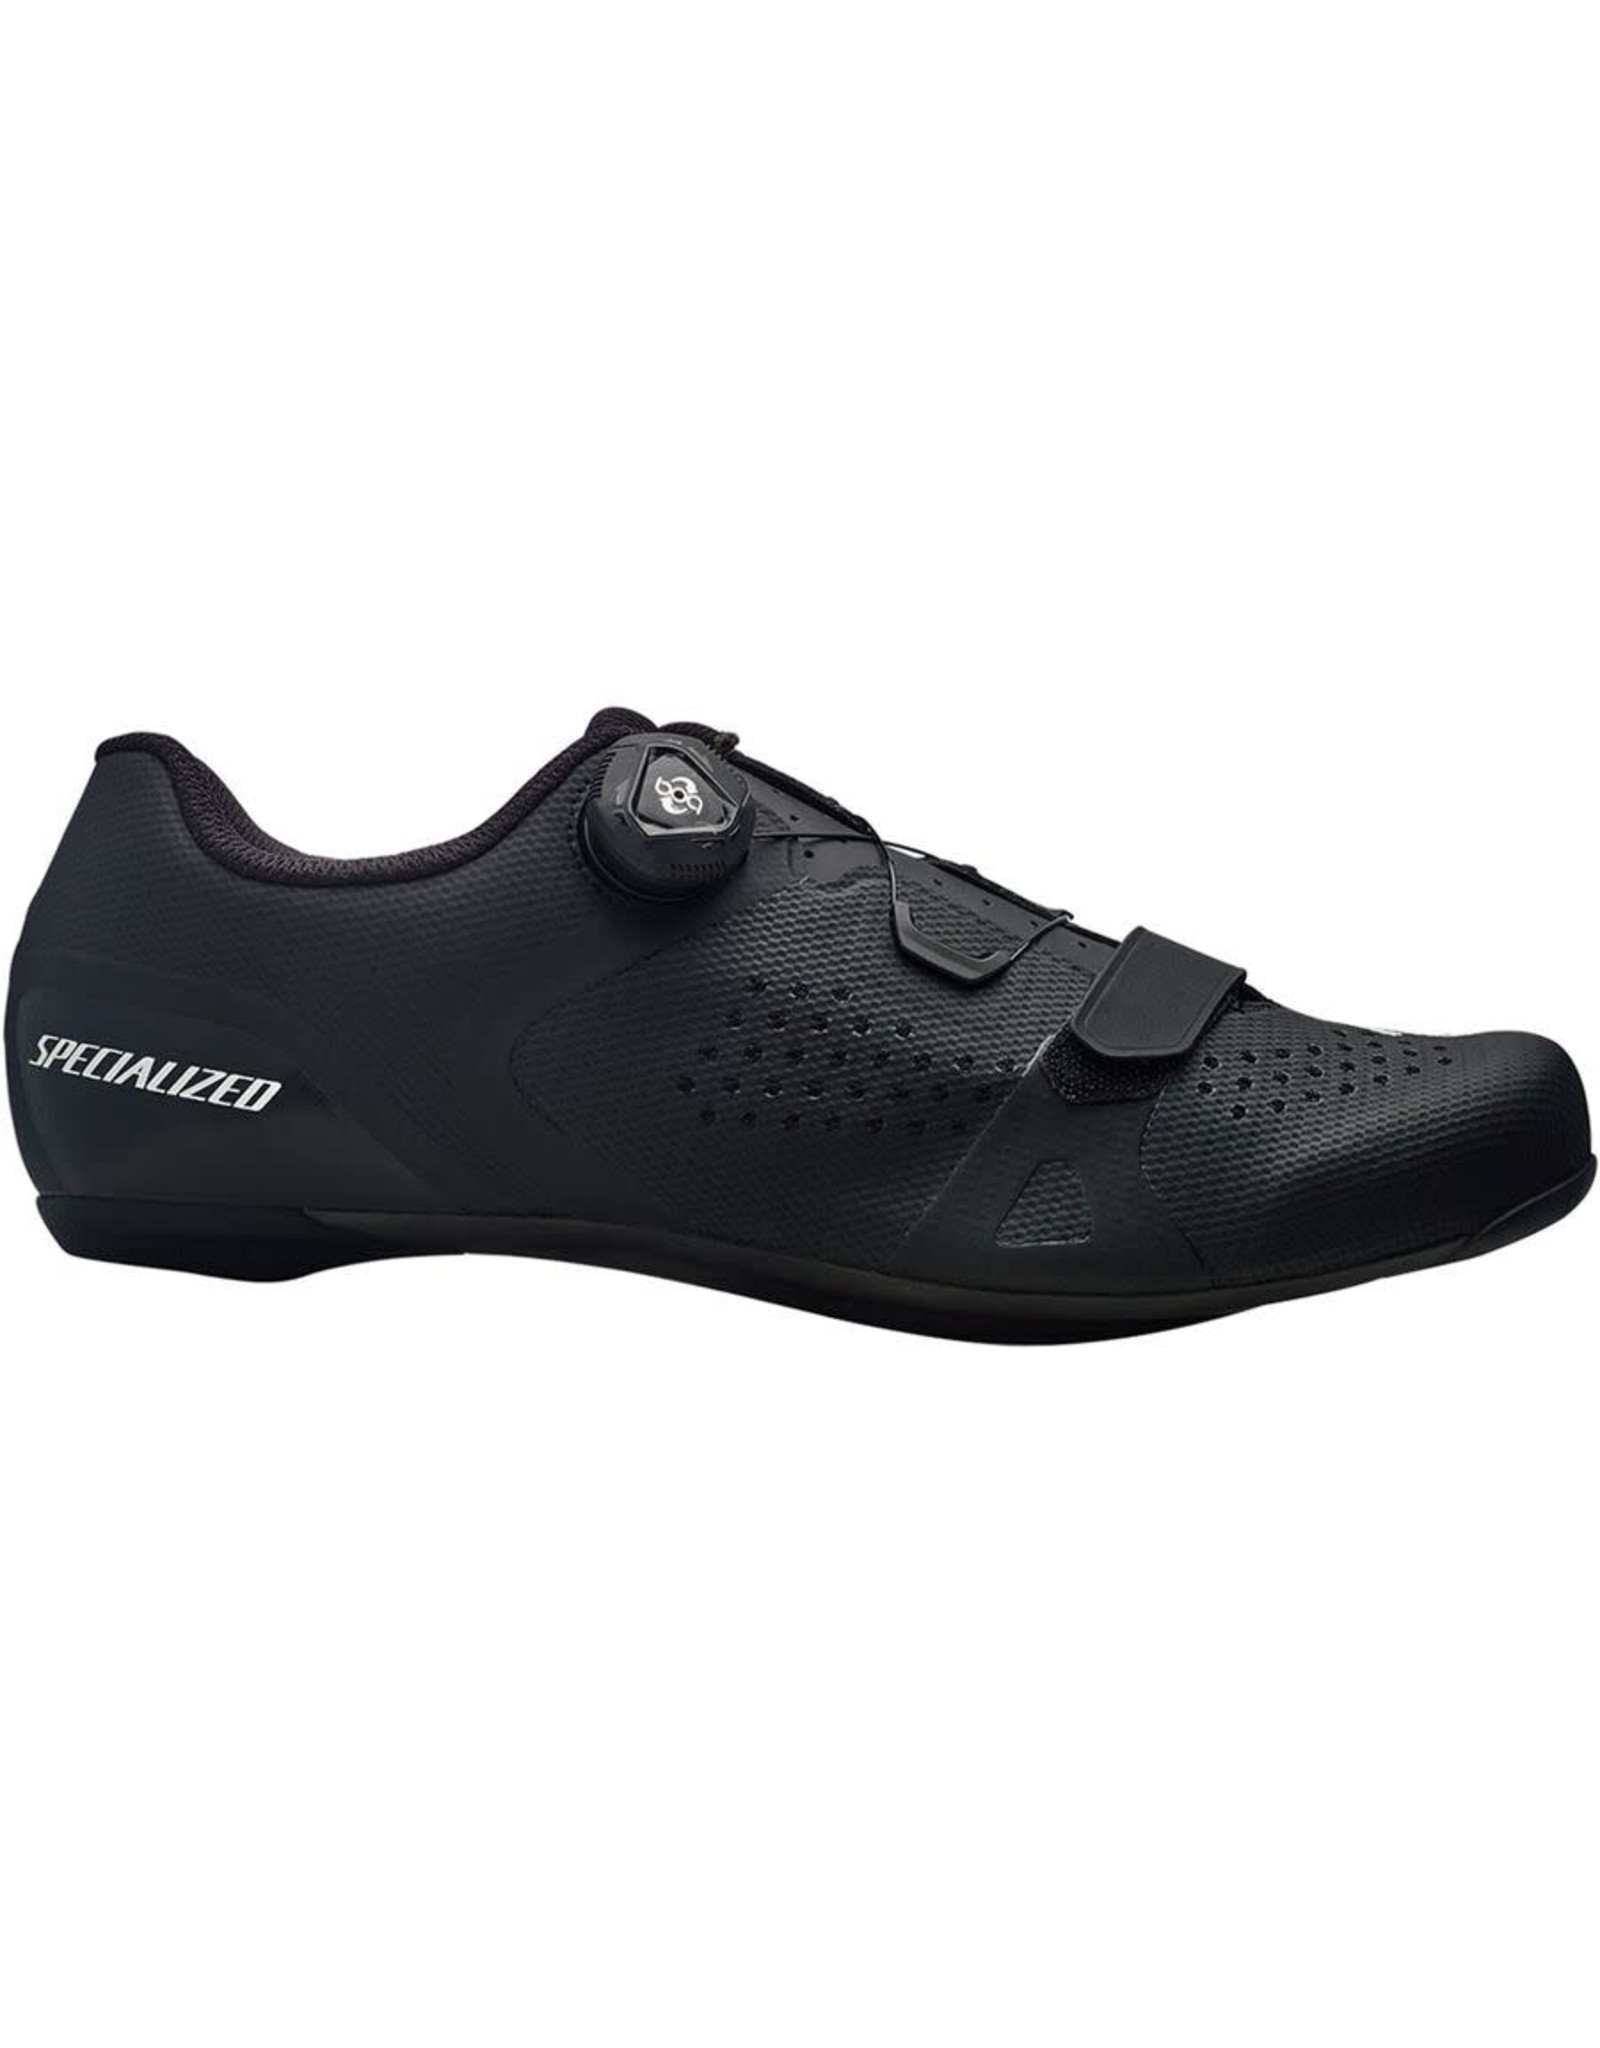 Specialized Shoe Spec Torch 2.0 Road Blk 44.5